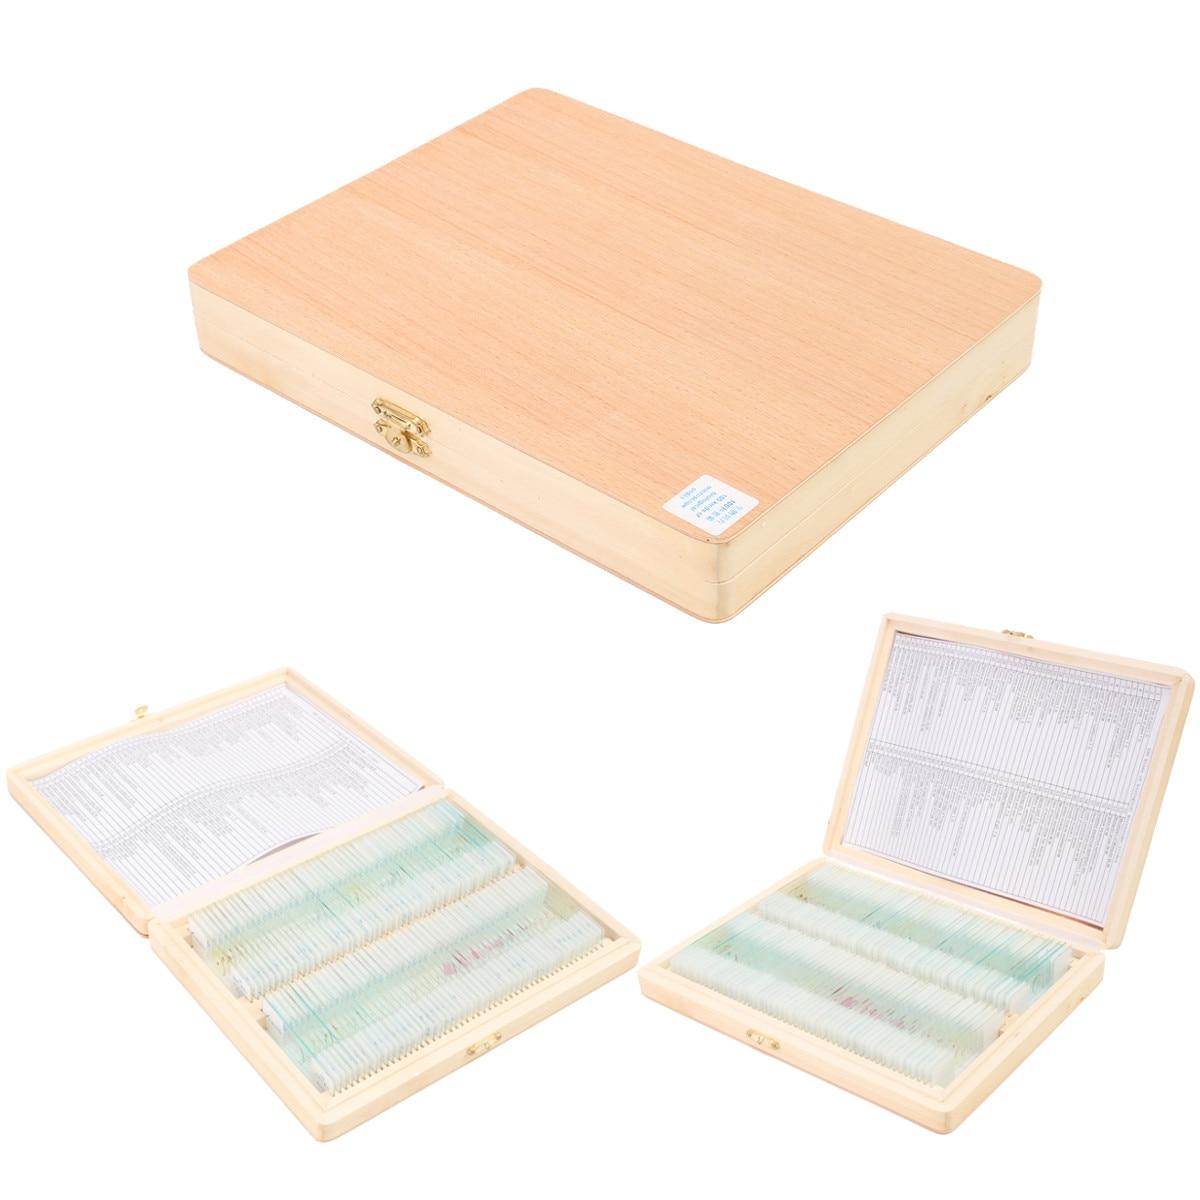 100Pcs Sample Specimen Basic Biological Glass Prepared Storage Set Slips Cover Microscope Wood Slides Science Box Portable Glass